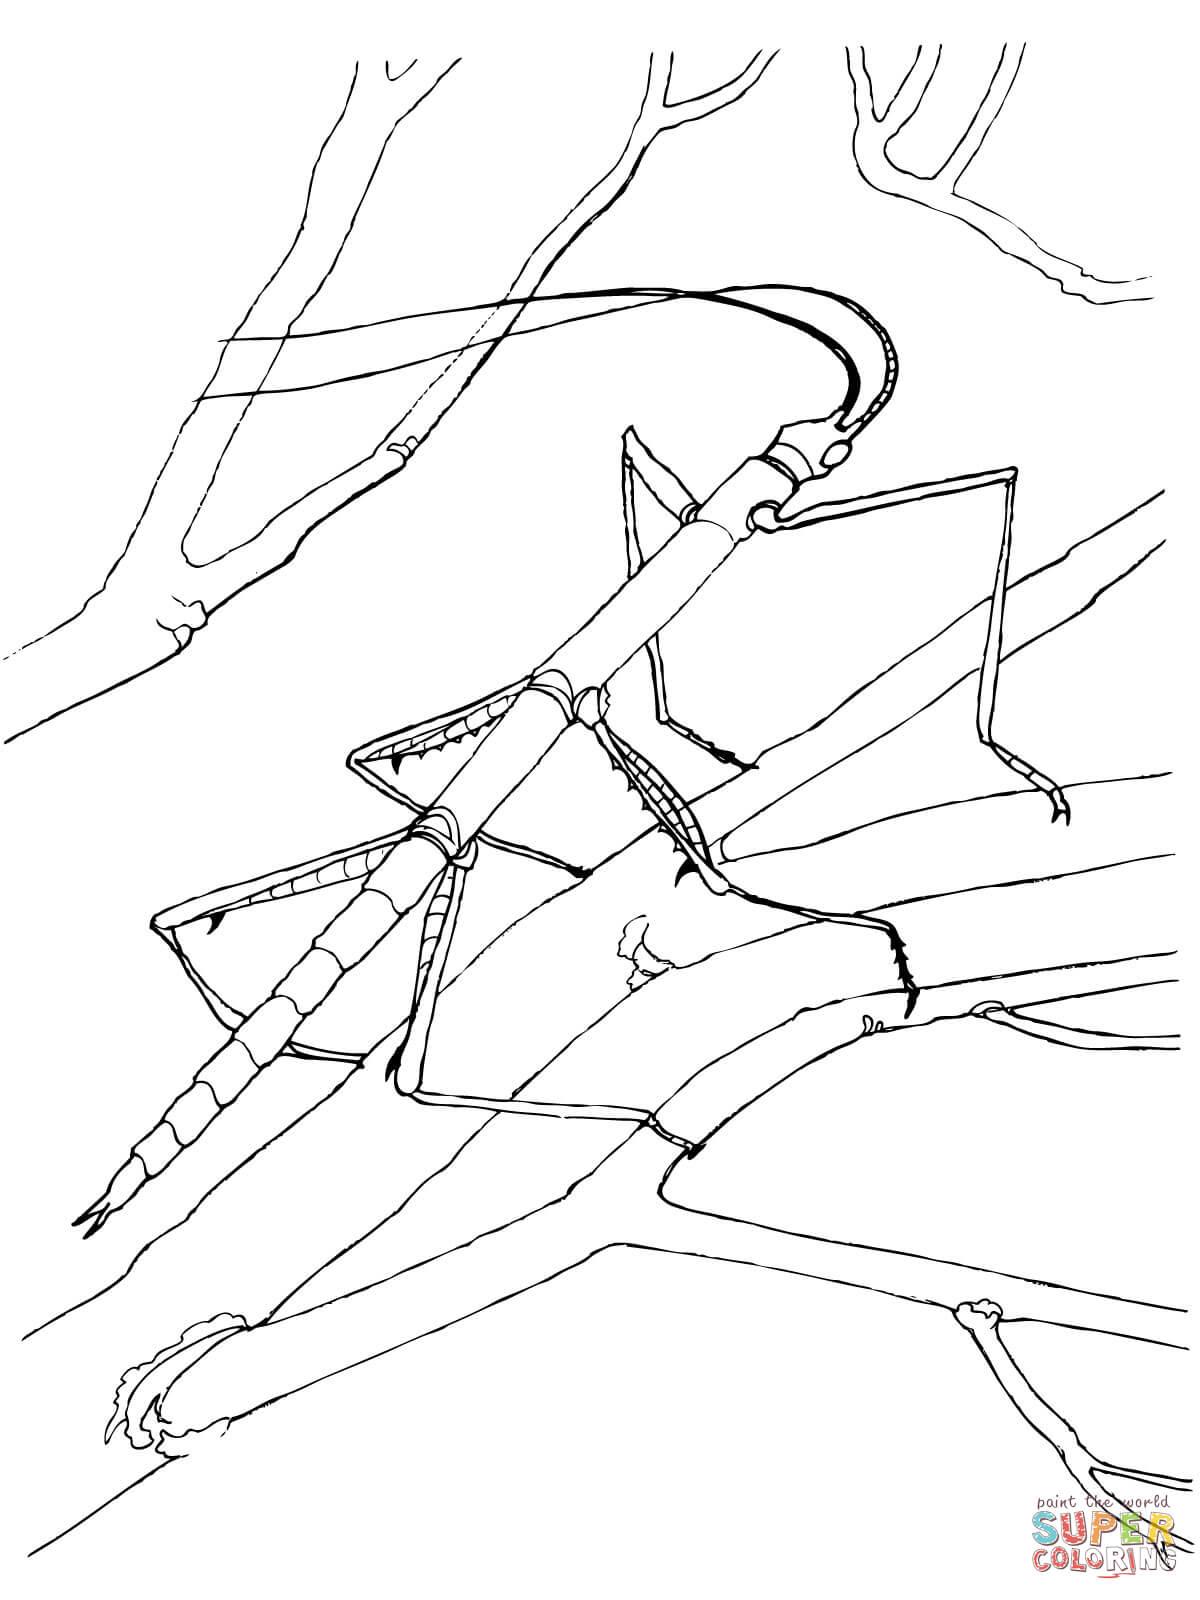 Walking Stick Bug Coloring Page